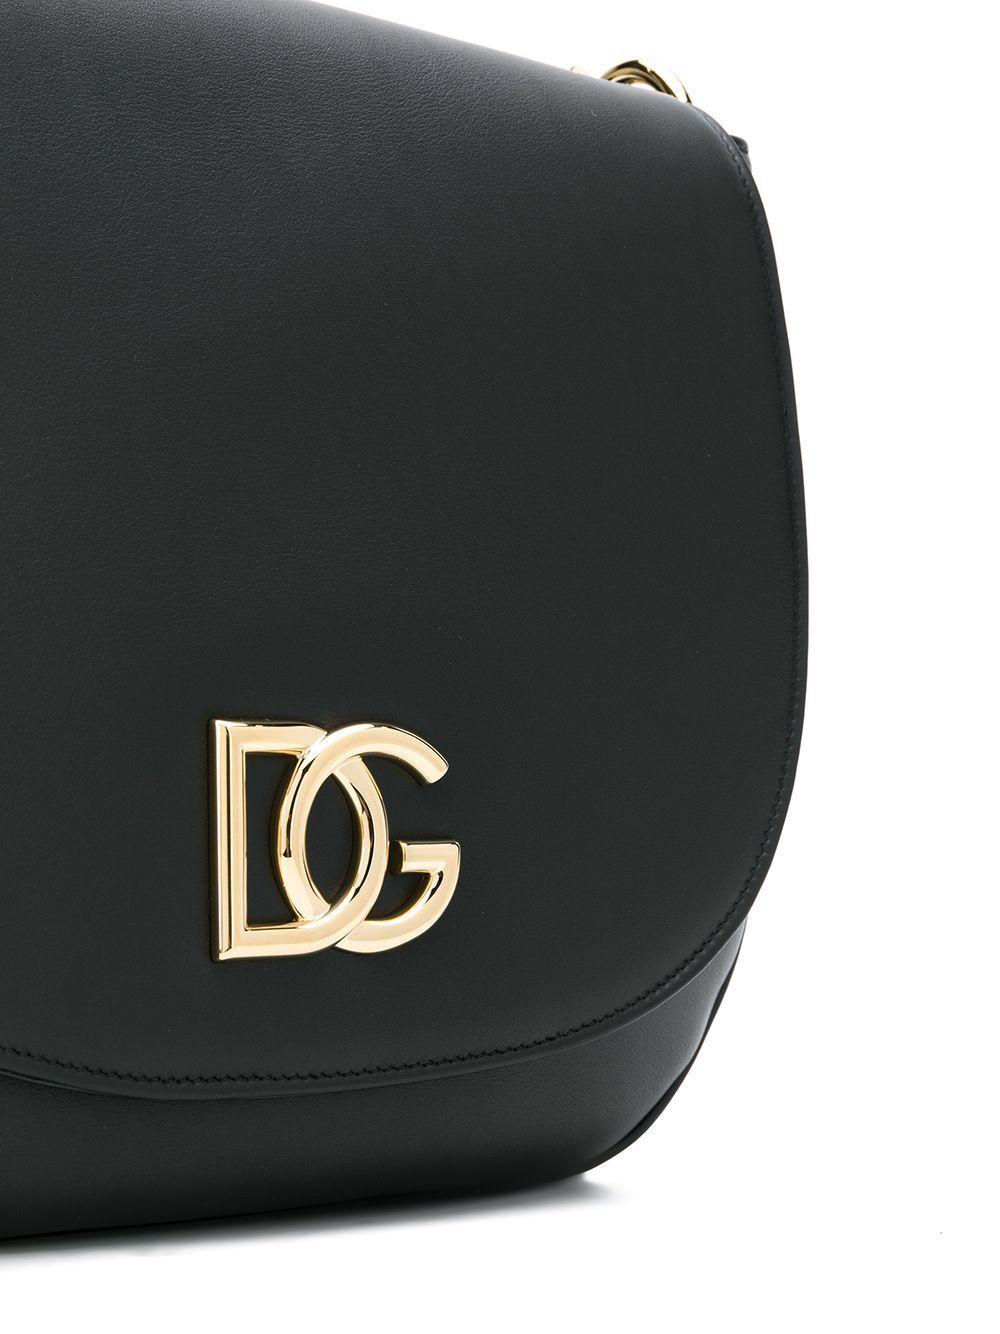 DOLCE E GABBANA WOMEN'S BB6819AX44180999 BLACK LEATHER SHOULDER BAG